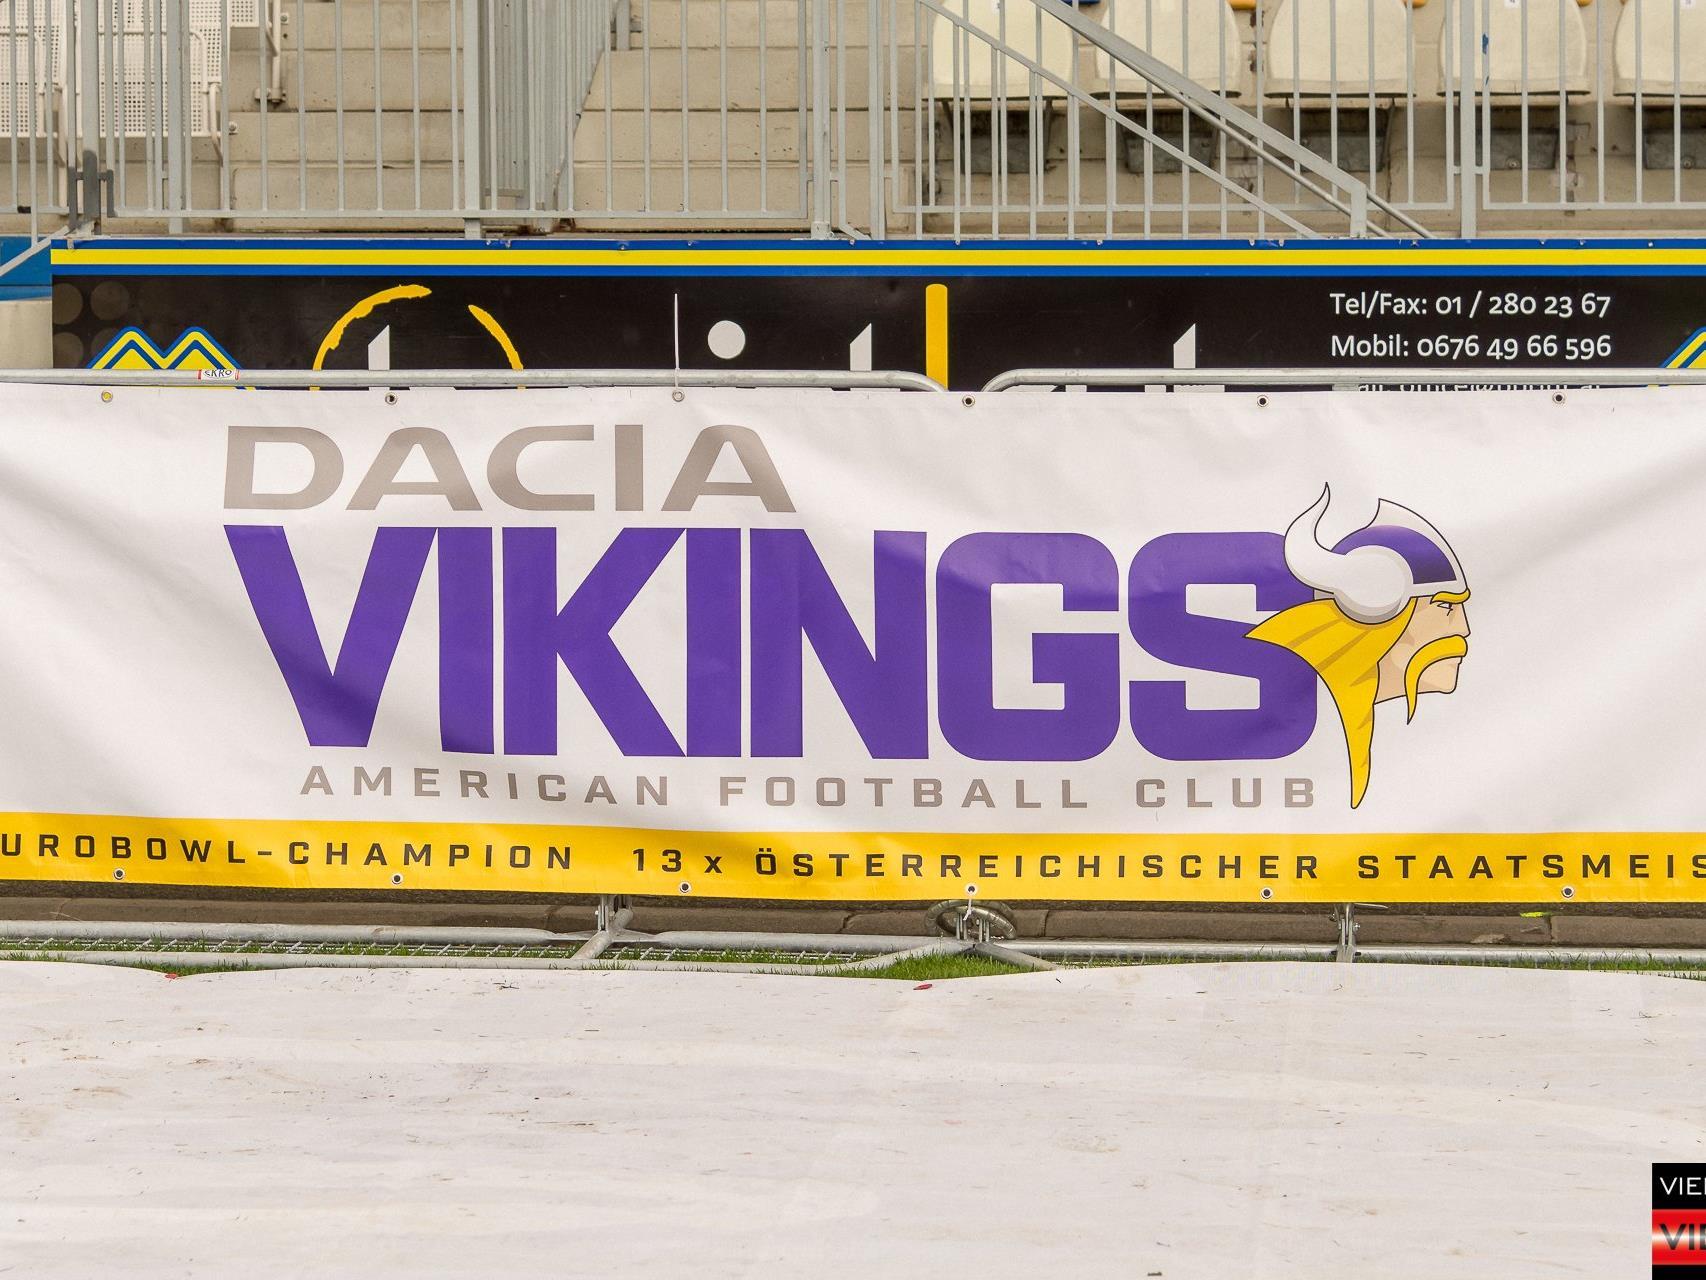 American Football - Dacia Vikings vs. Cineplex Blue Devils - Stadion Hohe Warte - 17.04.2017 Teil 1/2